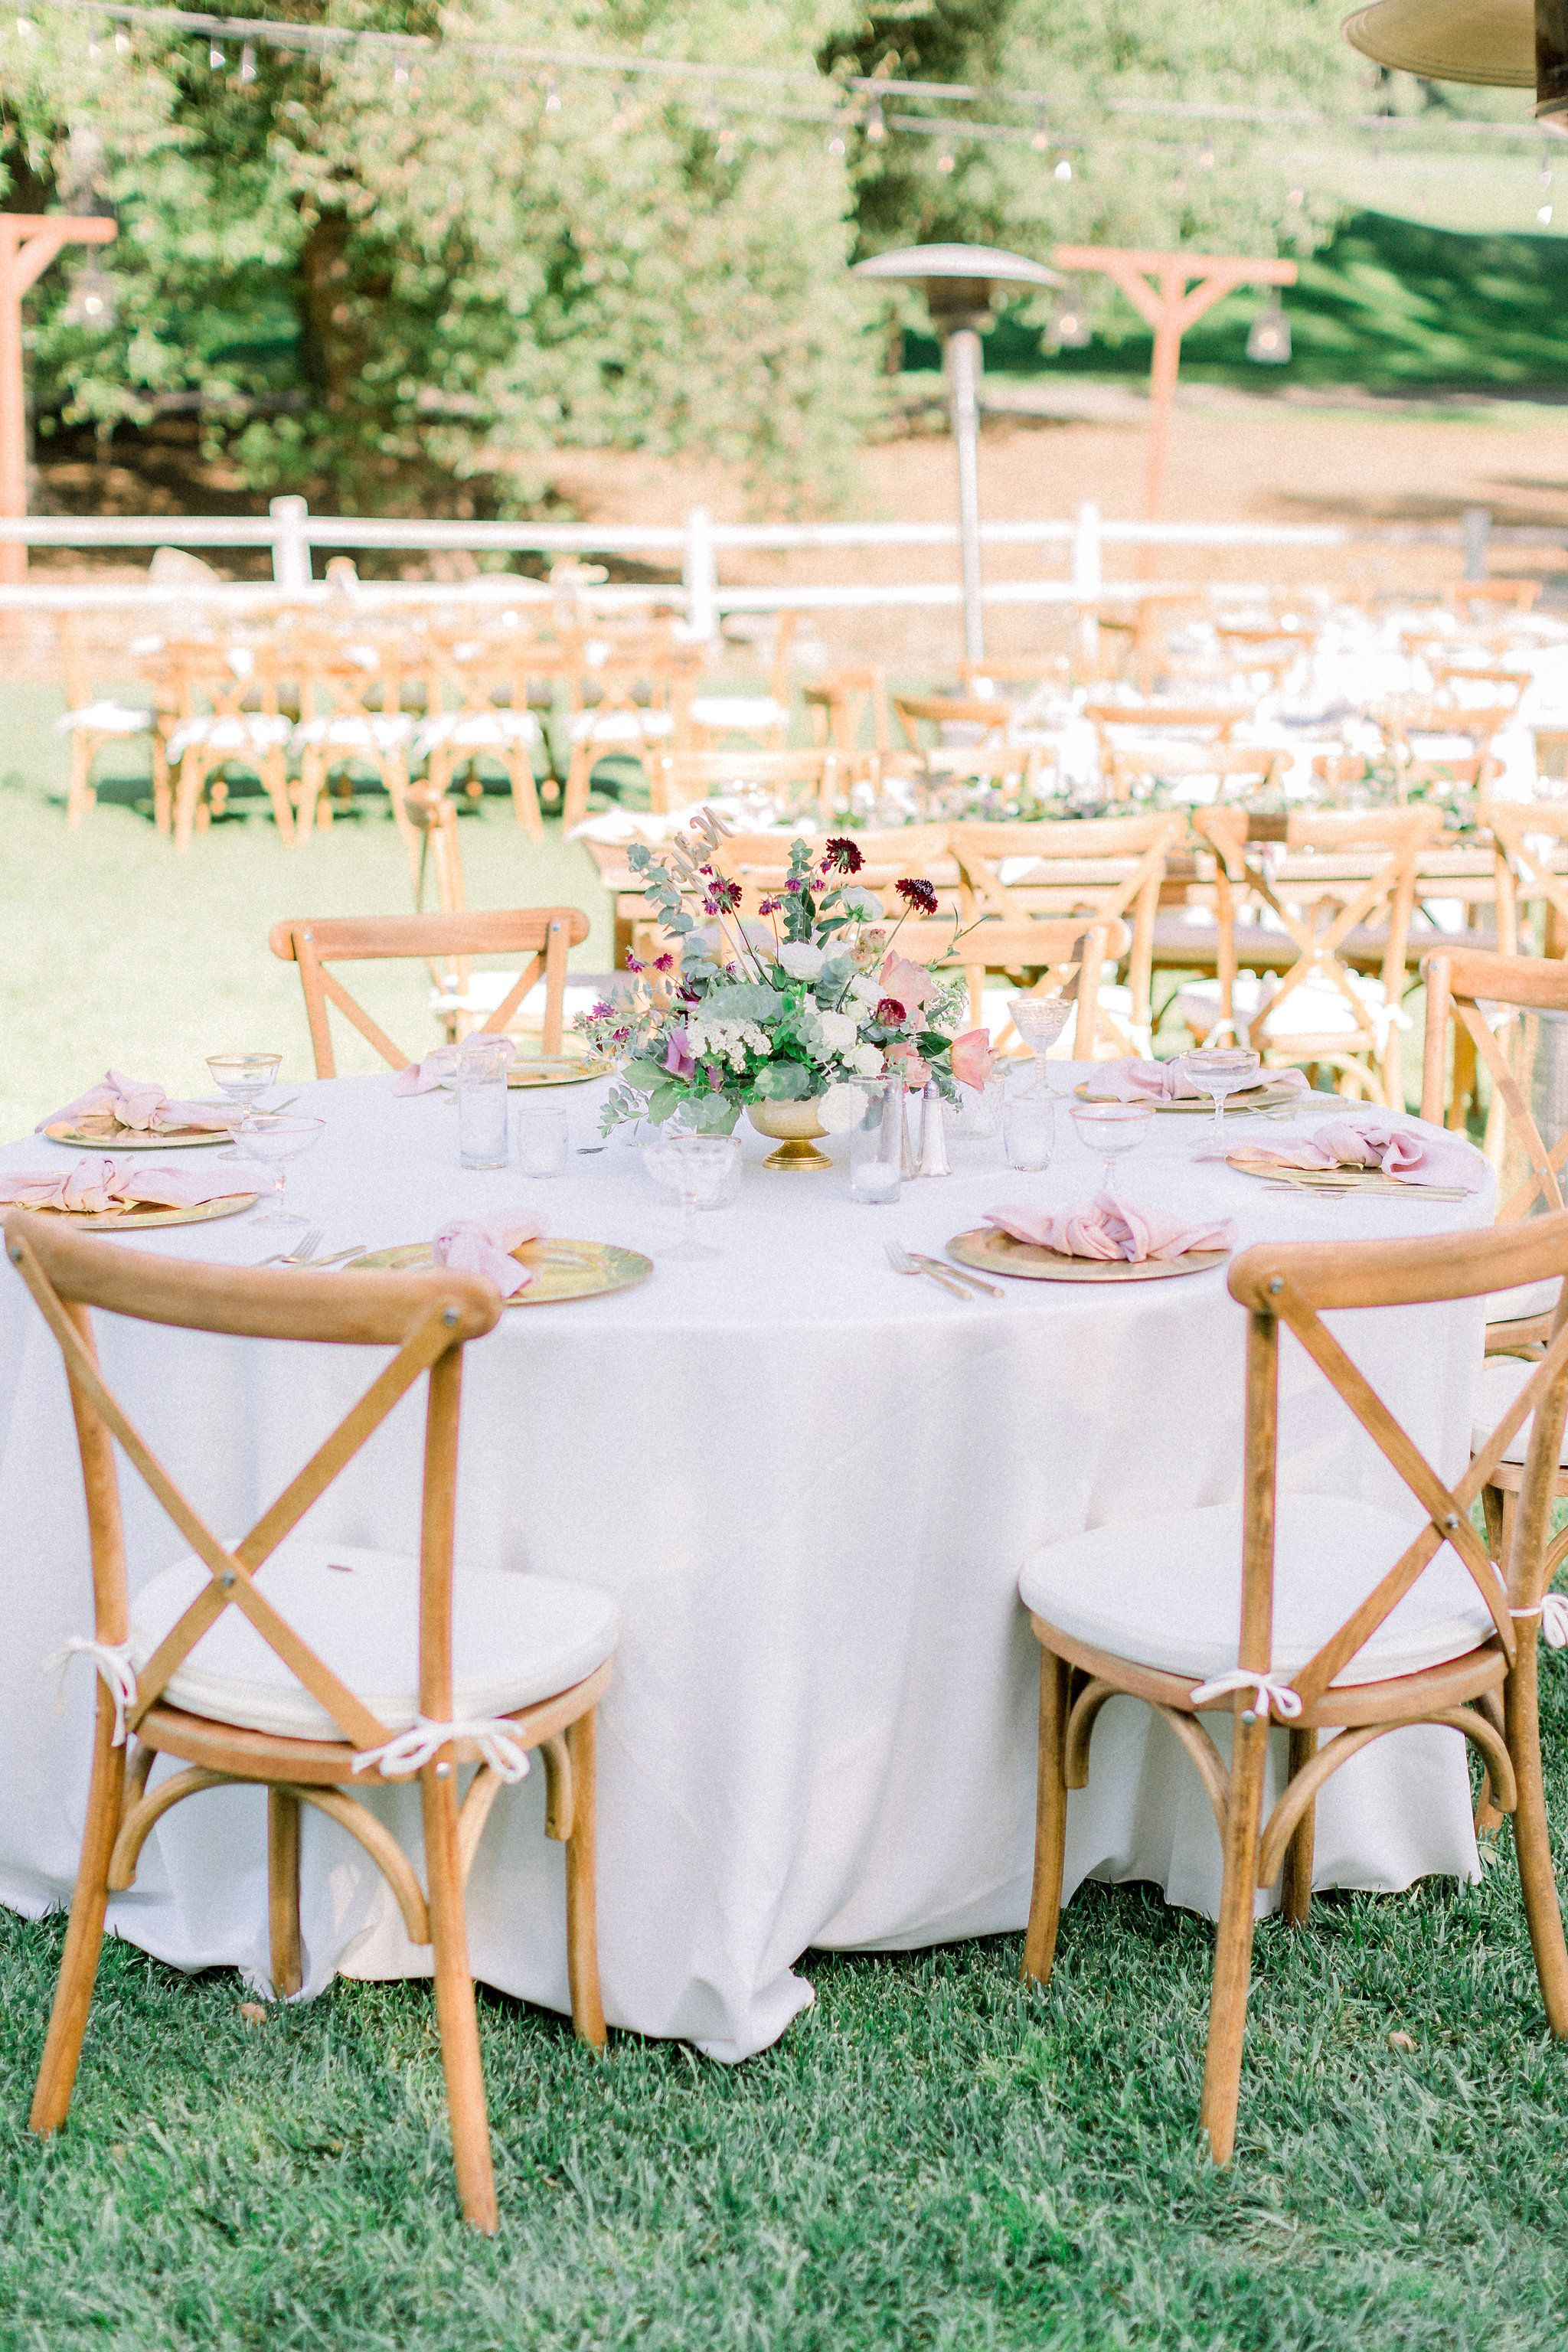 Farm Tables And More San Diego San Diego Wedding Rentals Cross Back Chairs Wedding Wedding Reception Chairs Round Wedding Tables Modern Wedding Reception